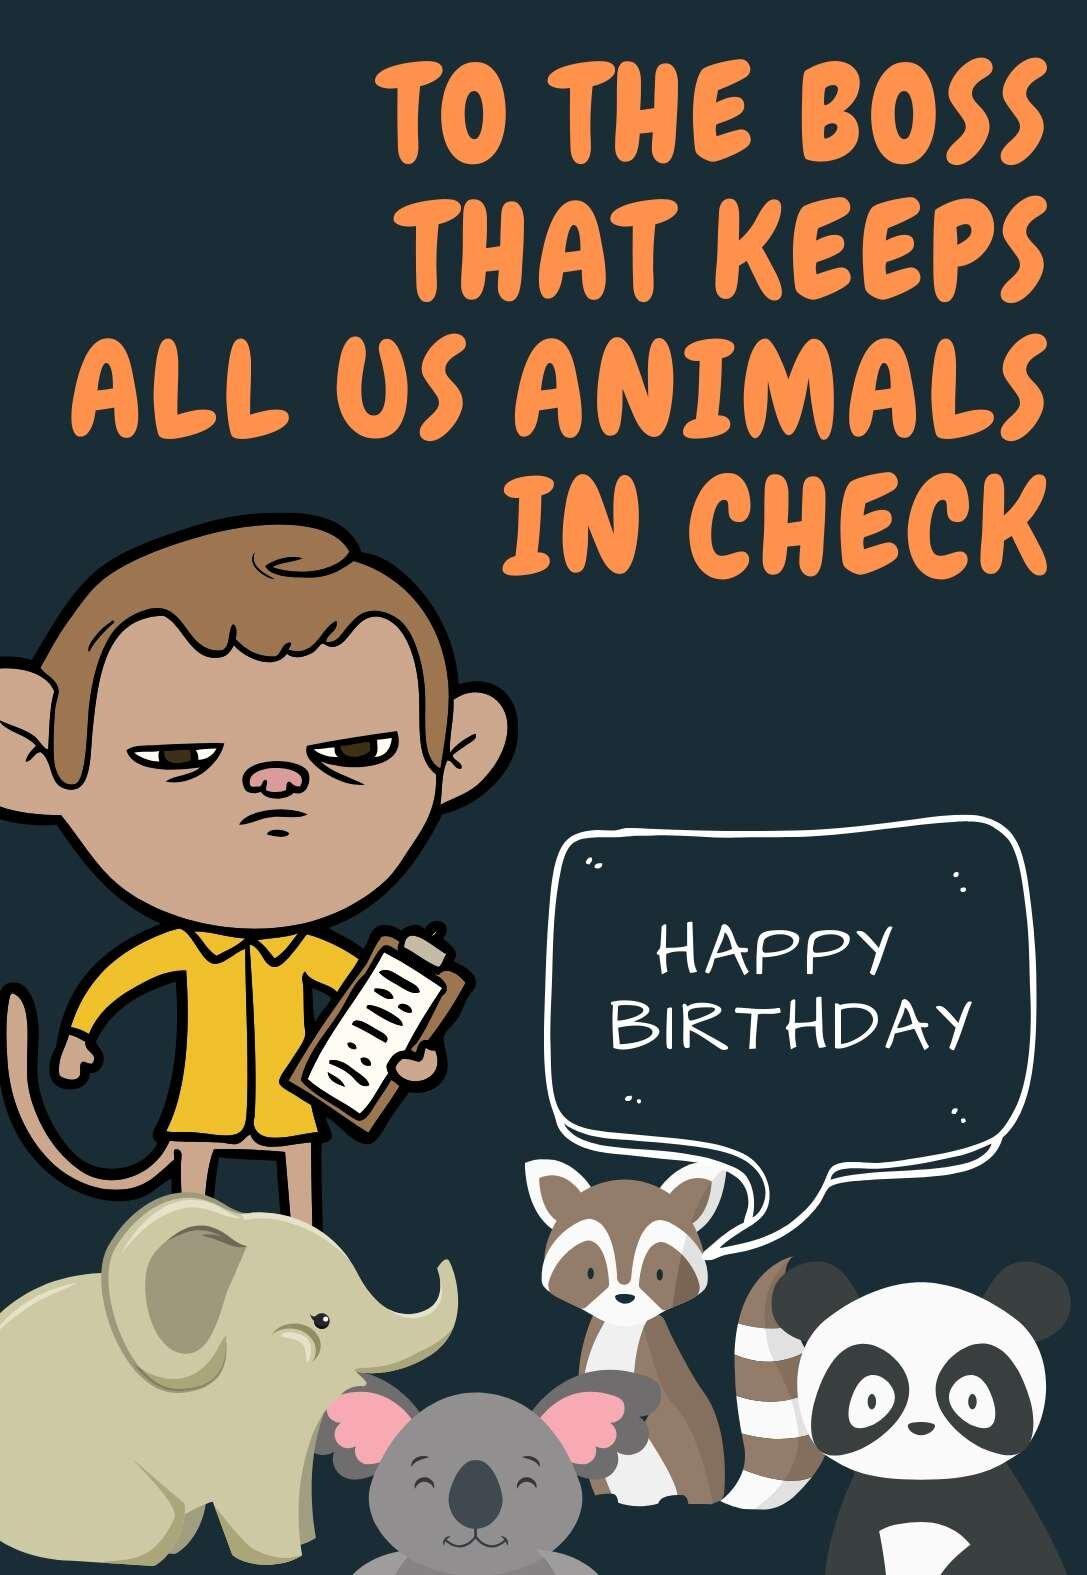 Boss Printable Birthday Cards Printbirthday Cards